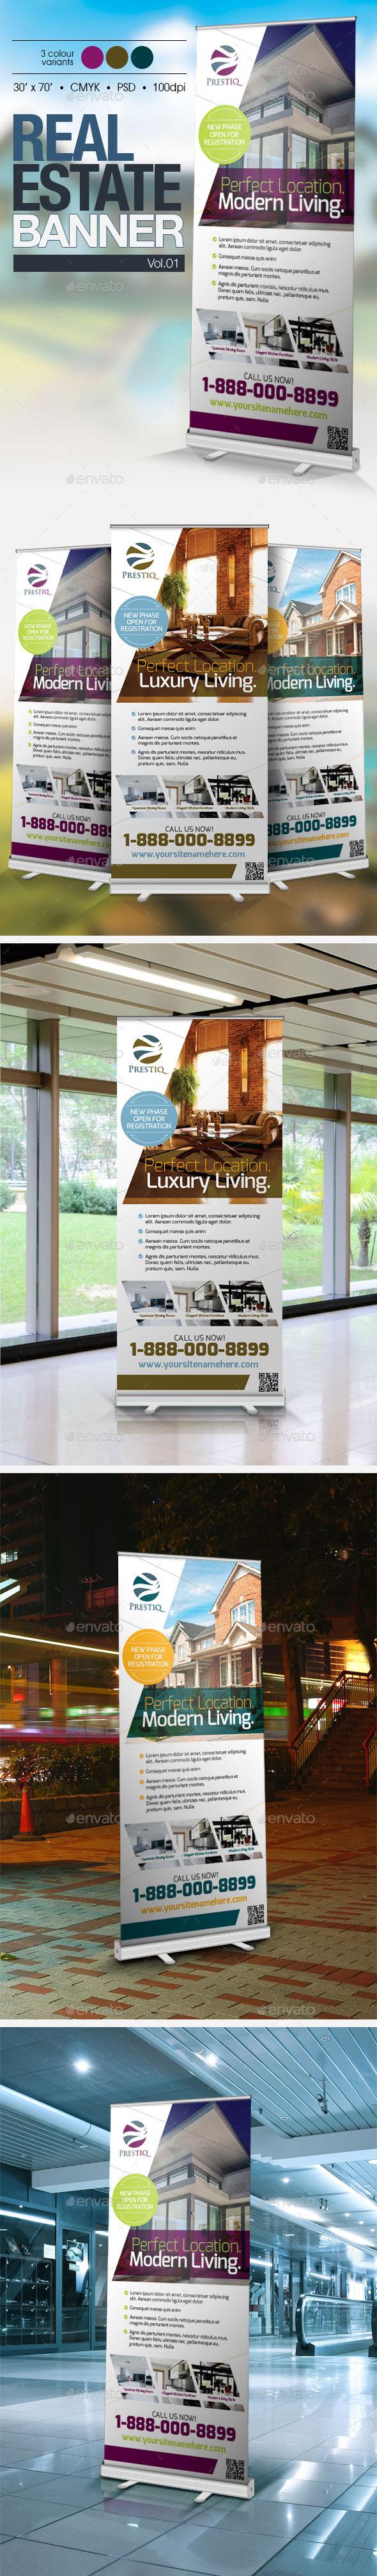 Real Estate Banner Vol.01 - Signage Print Templates